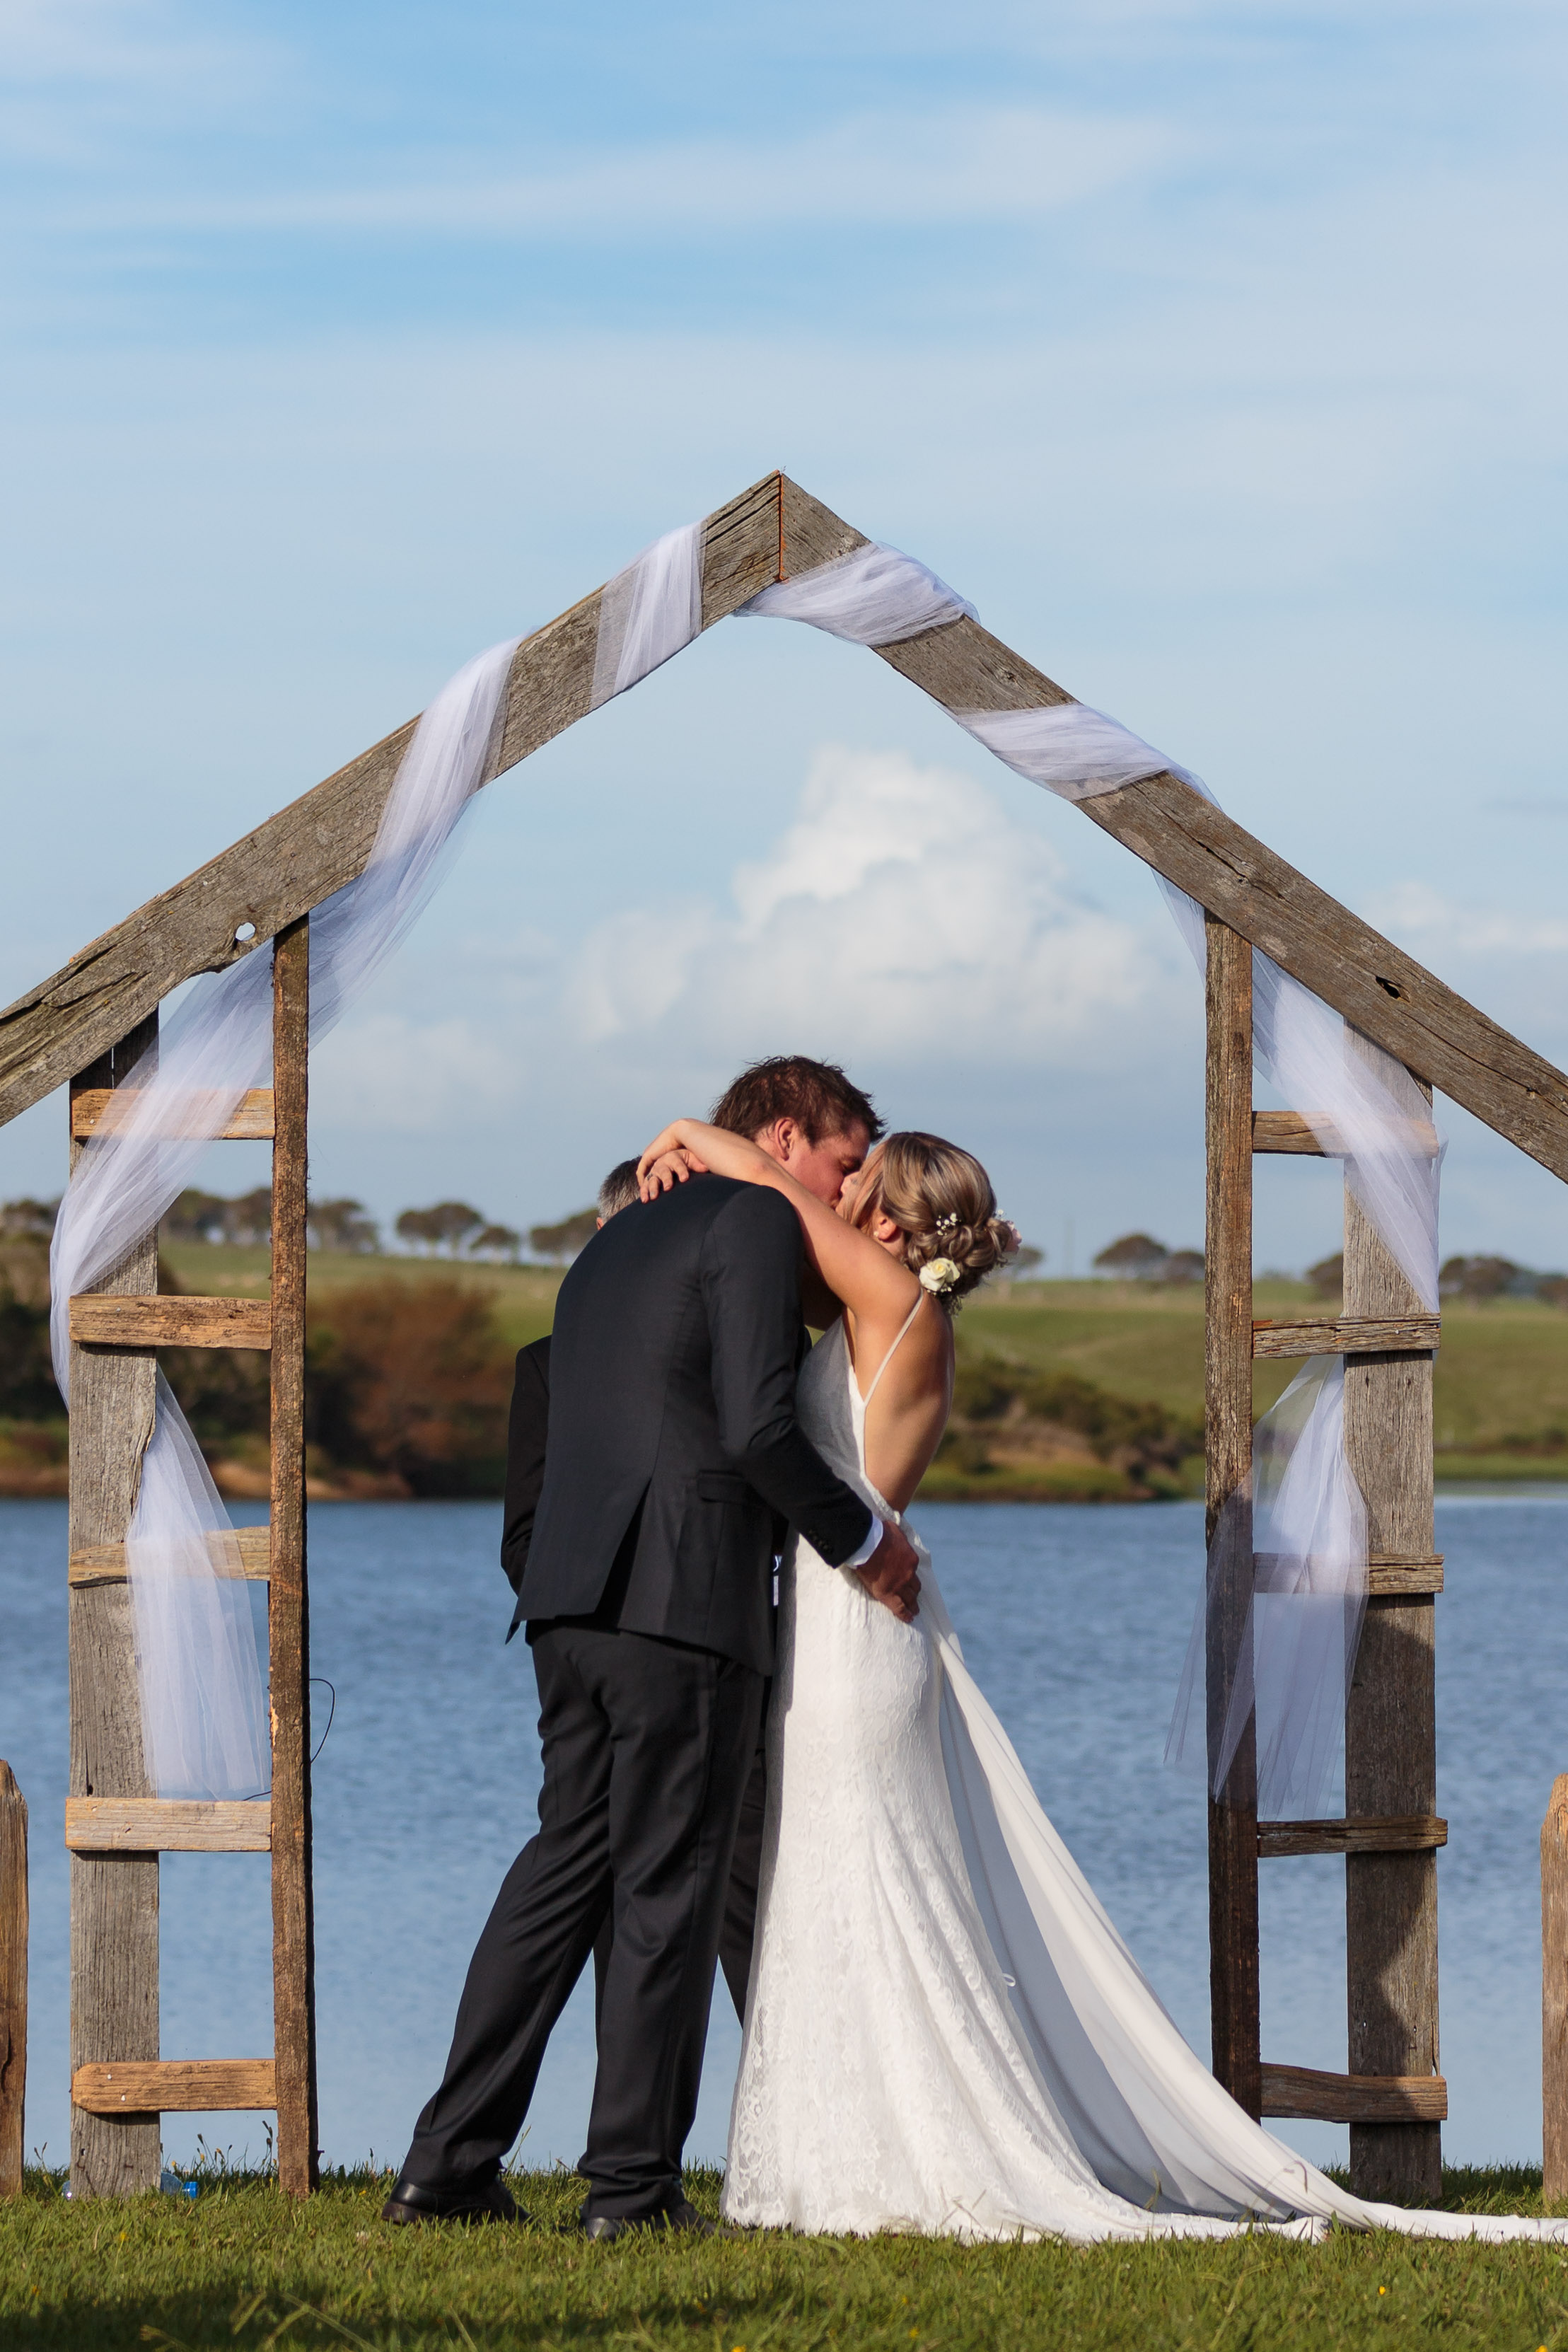 Highight-wedding-photography-dudding-lake-palmerston-north-new-zealand-37.jpg